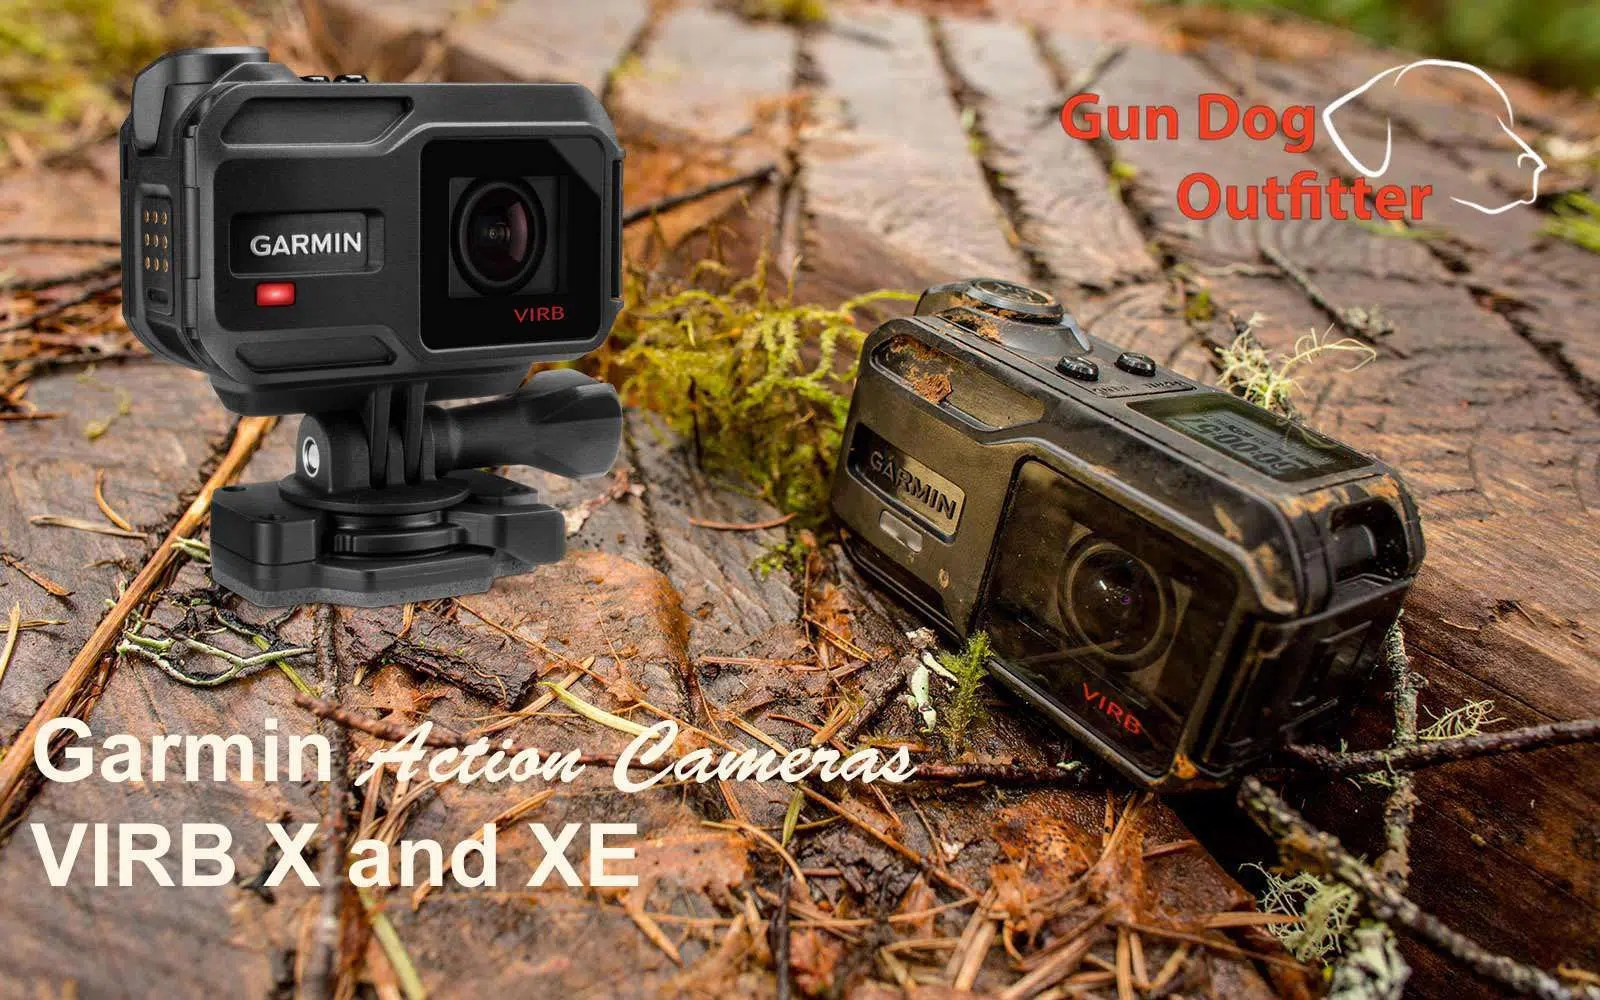 Garmin VIRB Action Cameras